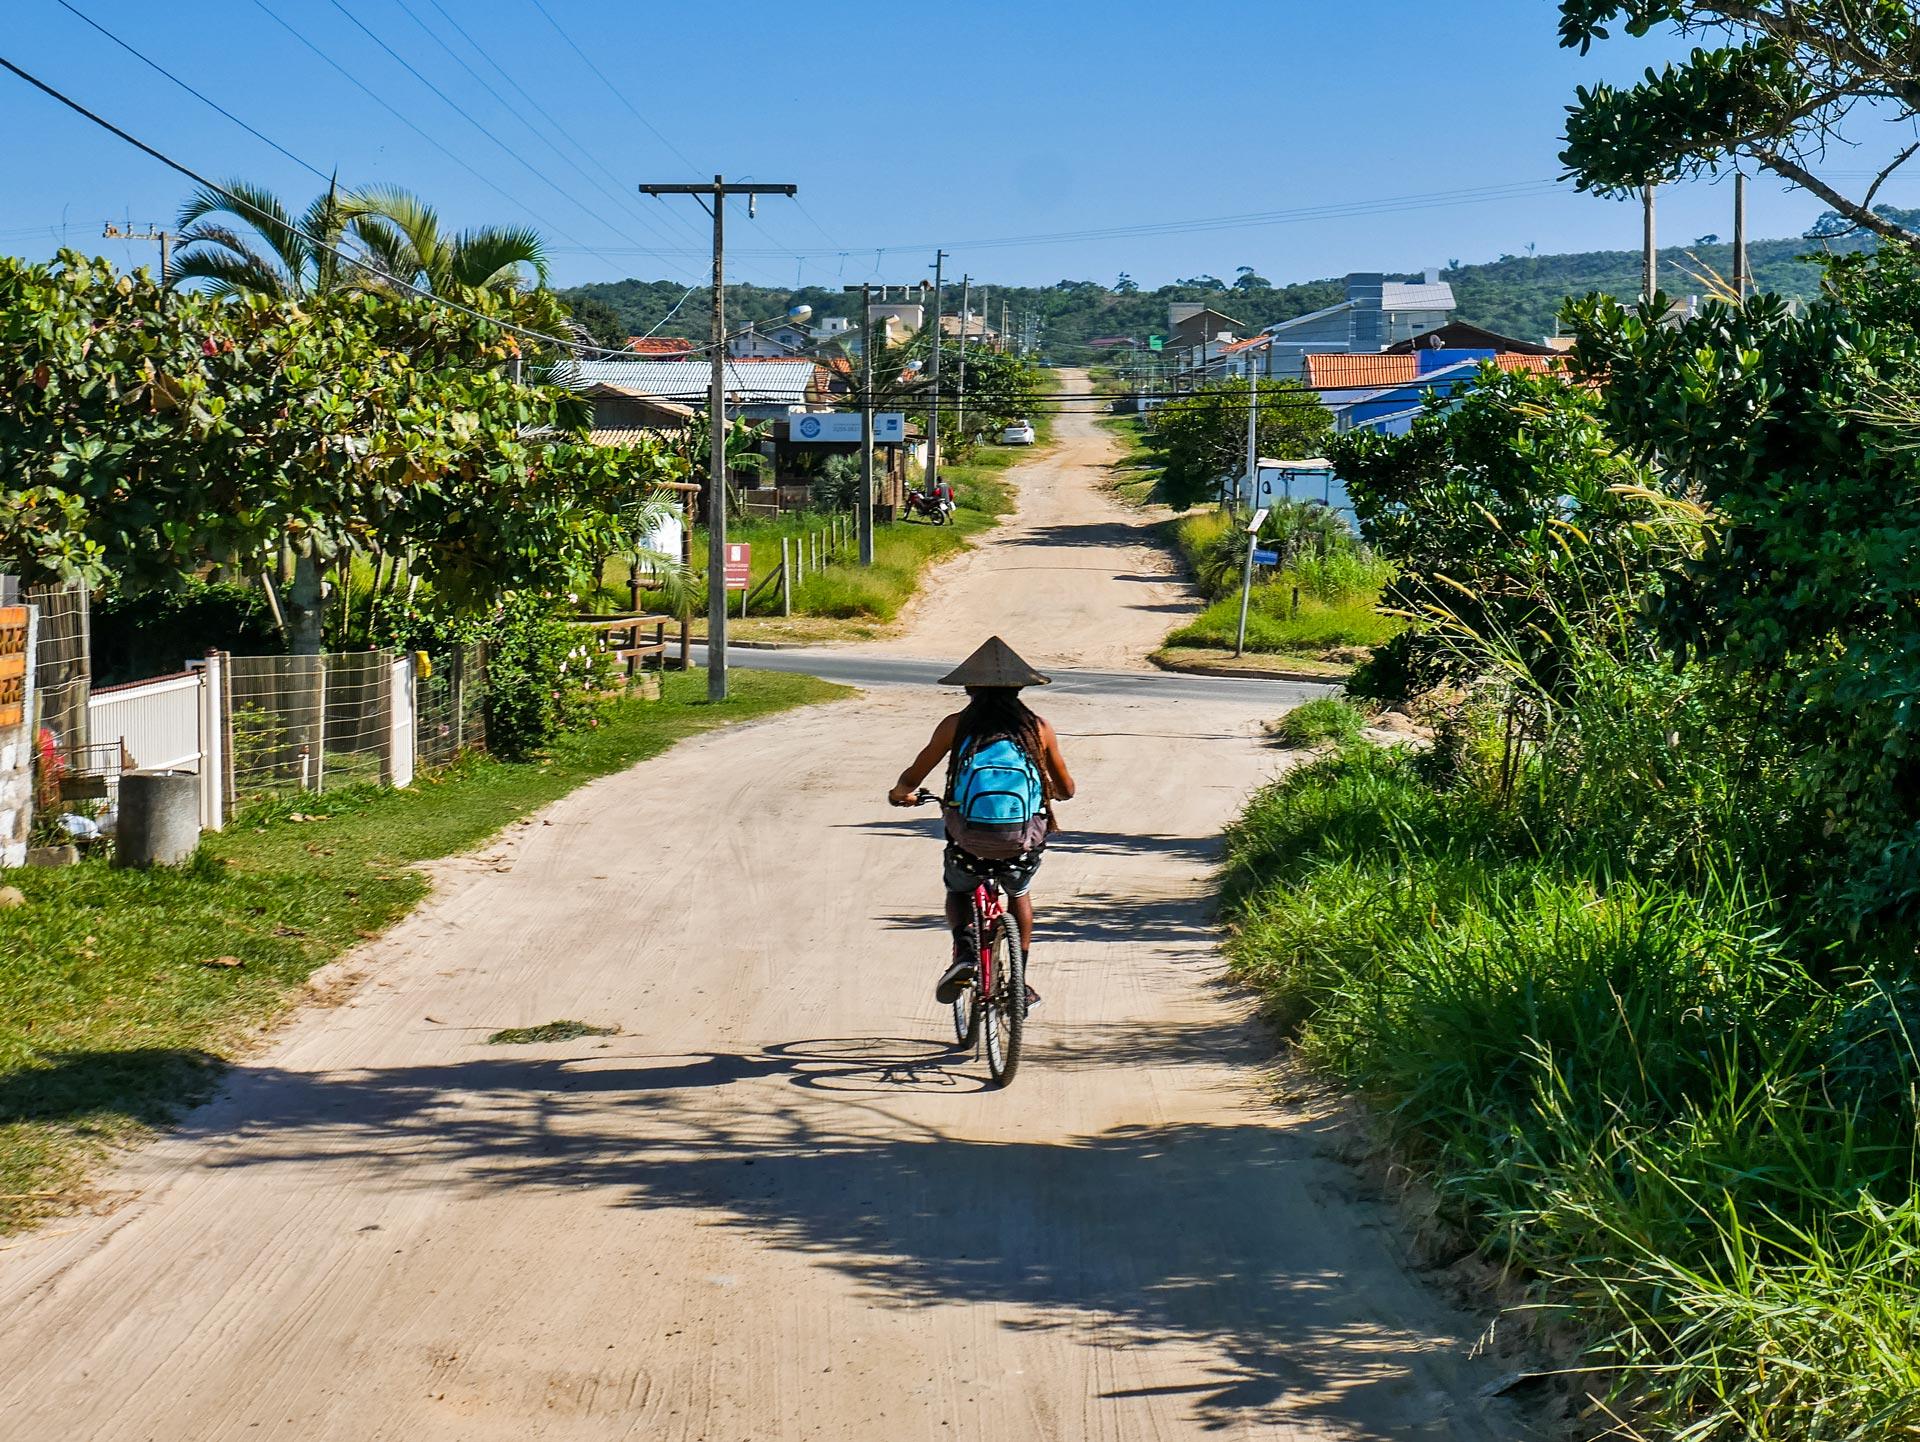 Rastaman riding bike on dirt road in Imbituba, Brazil